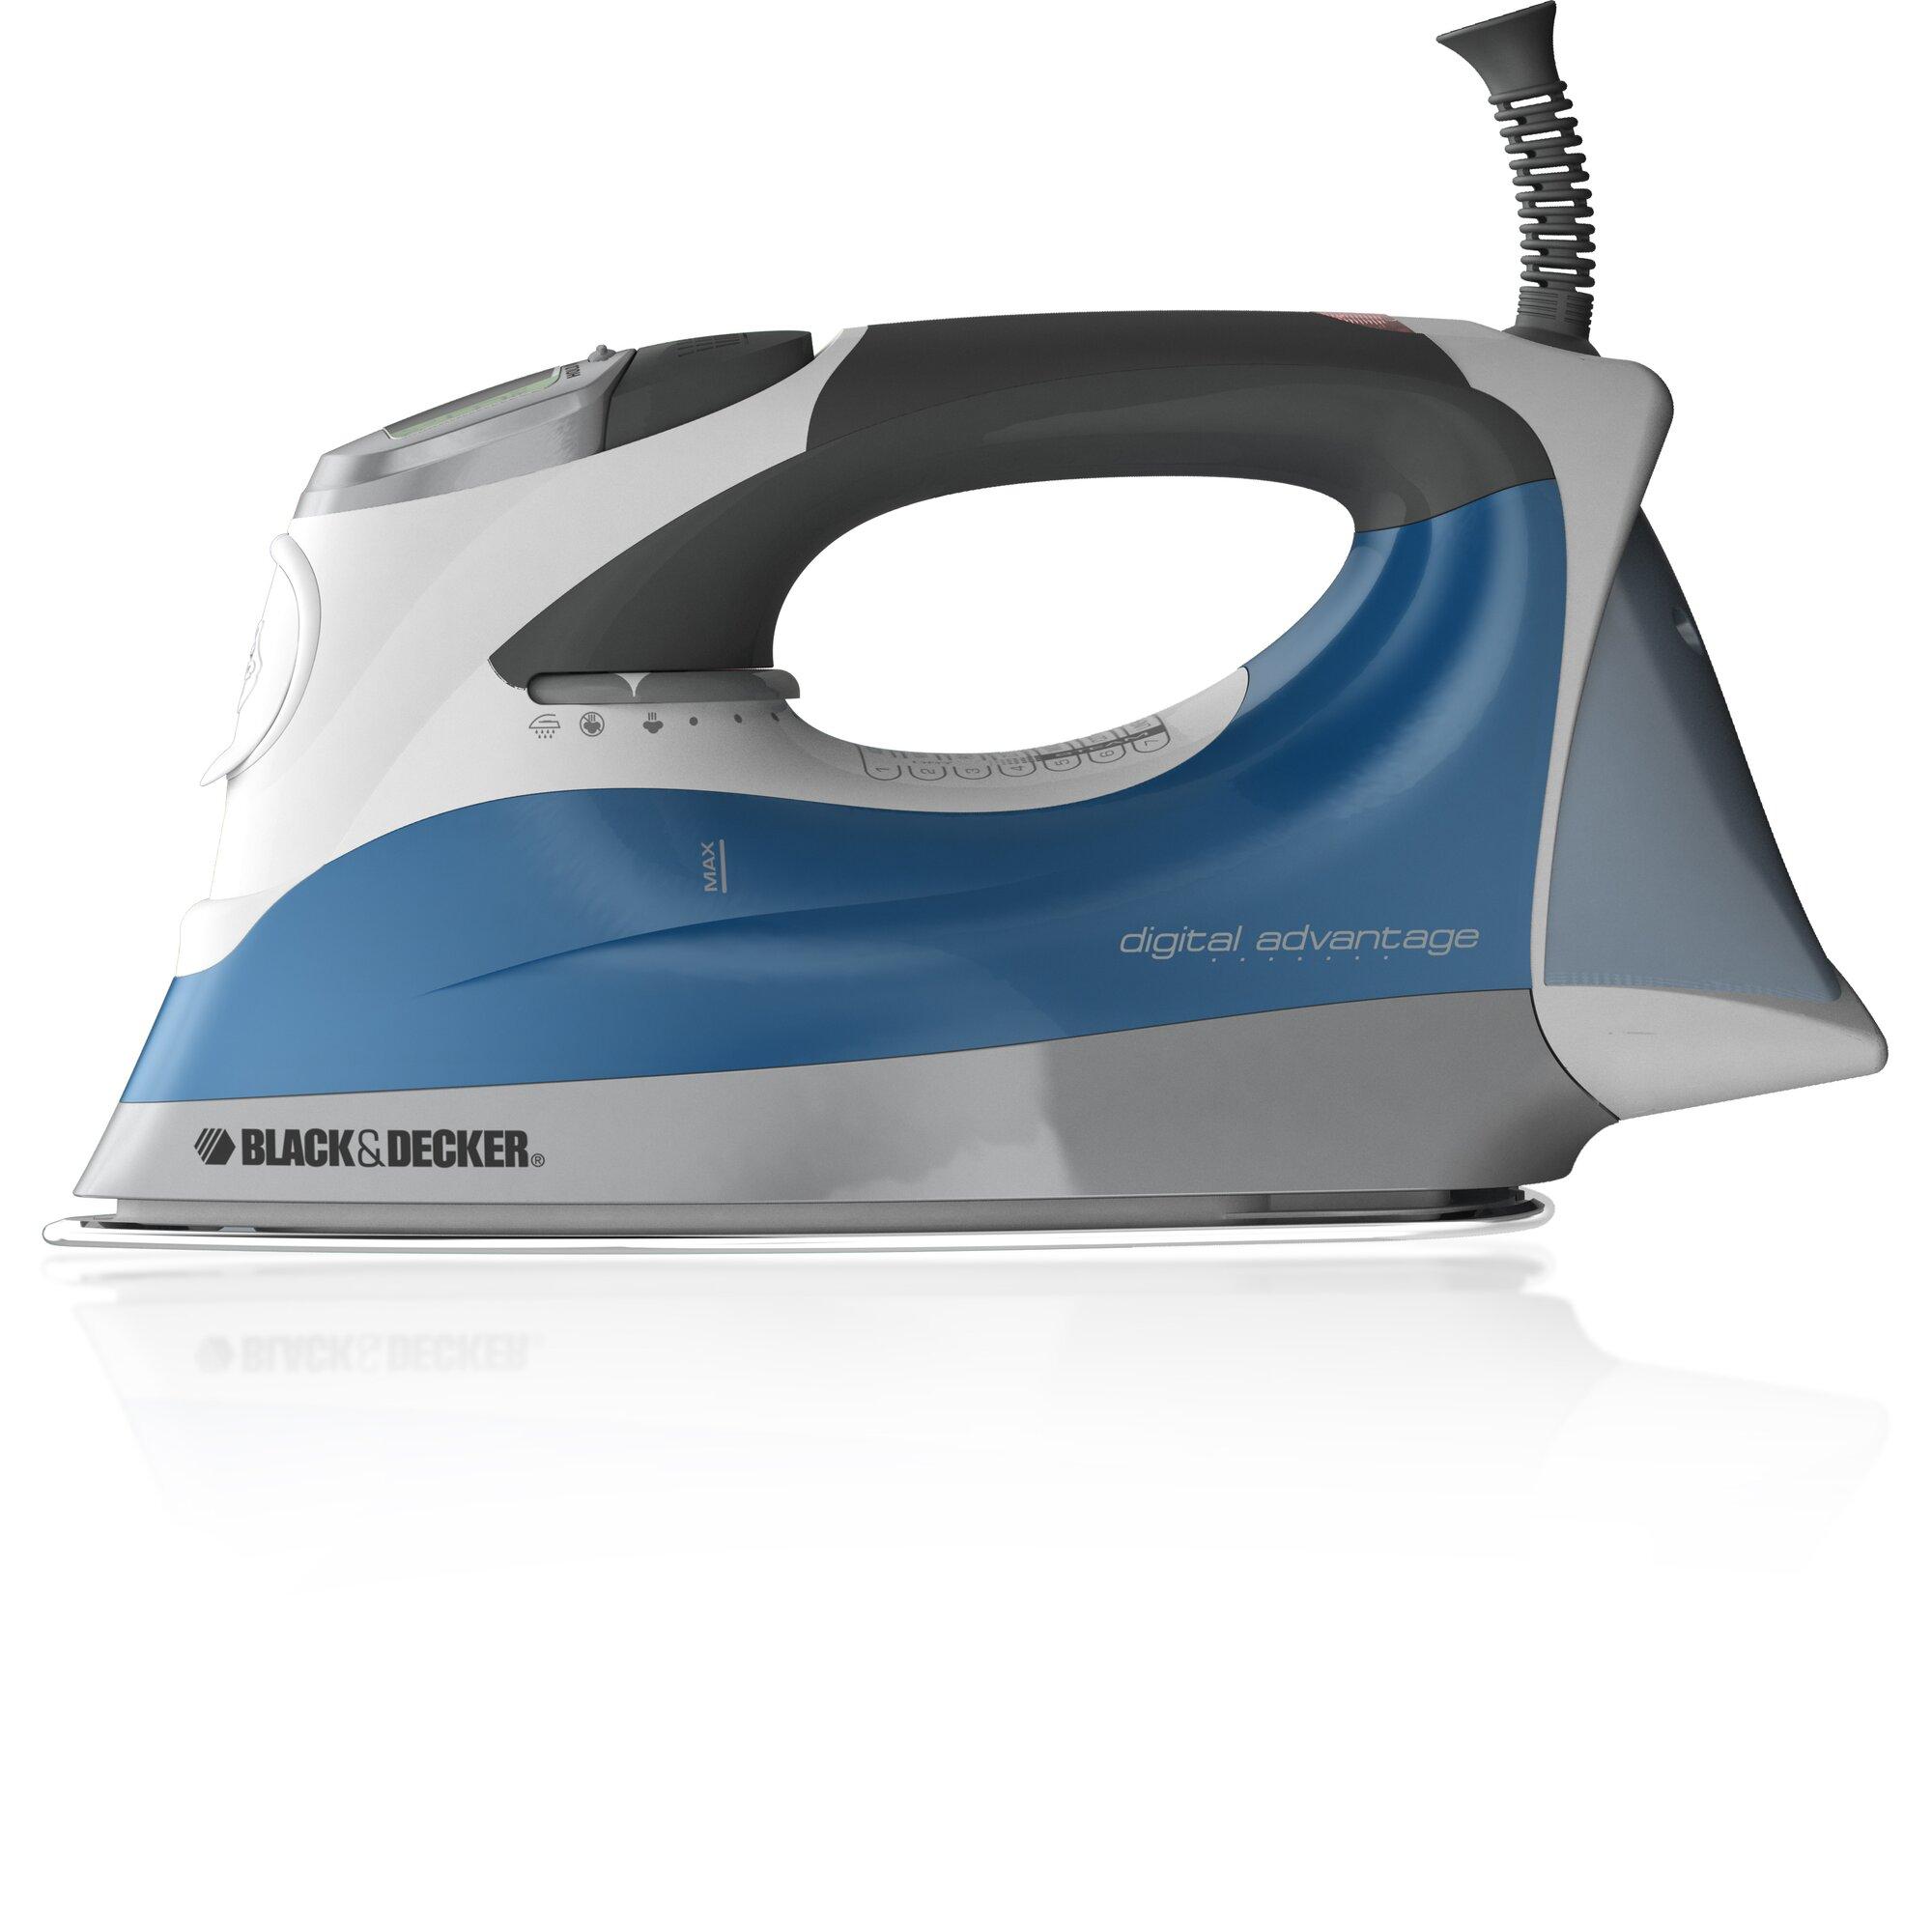 Digital Steam Irons ~ Black decker digital advantage™ professional steam iron